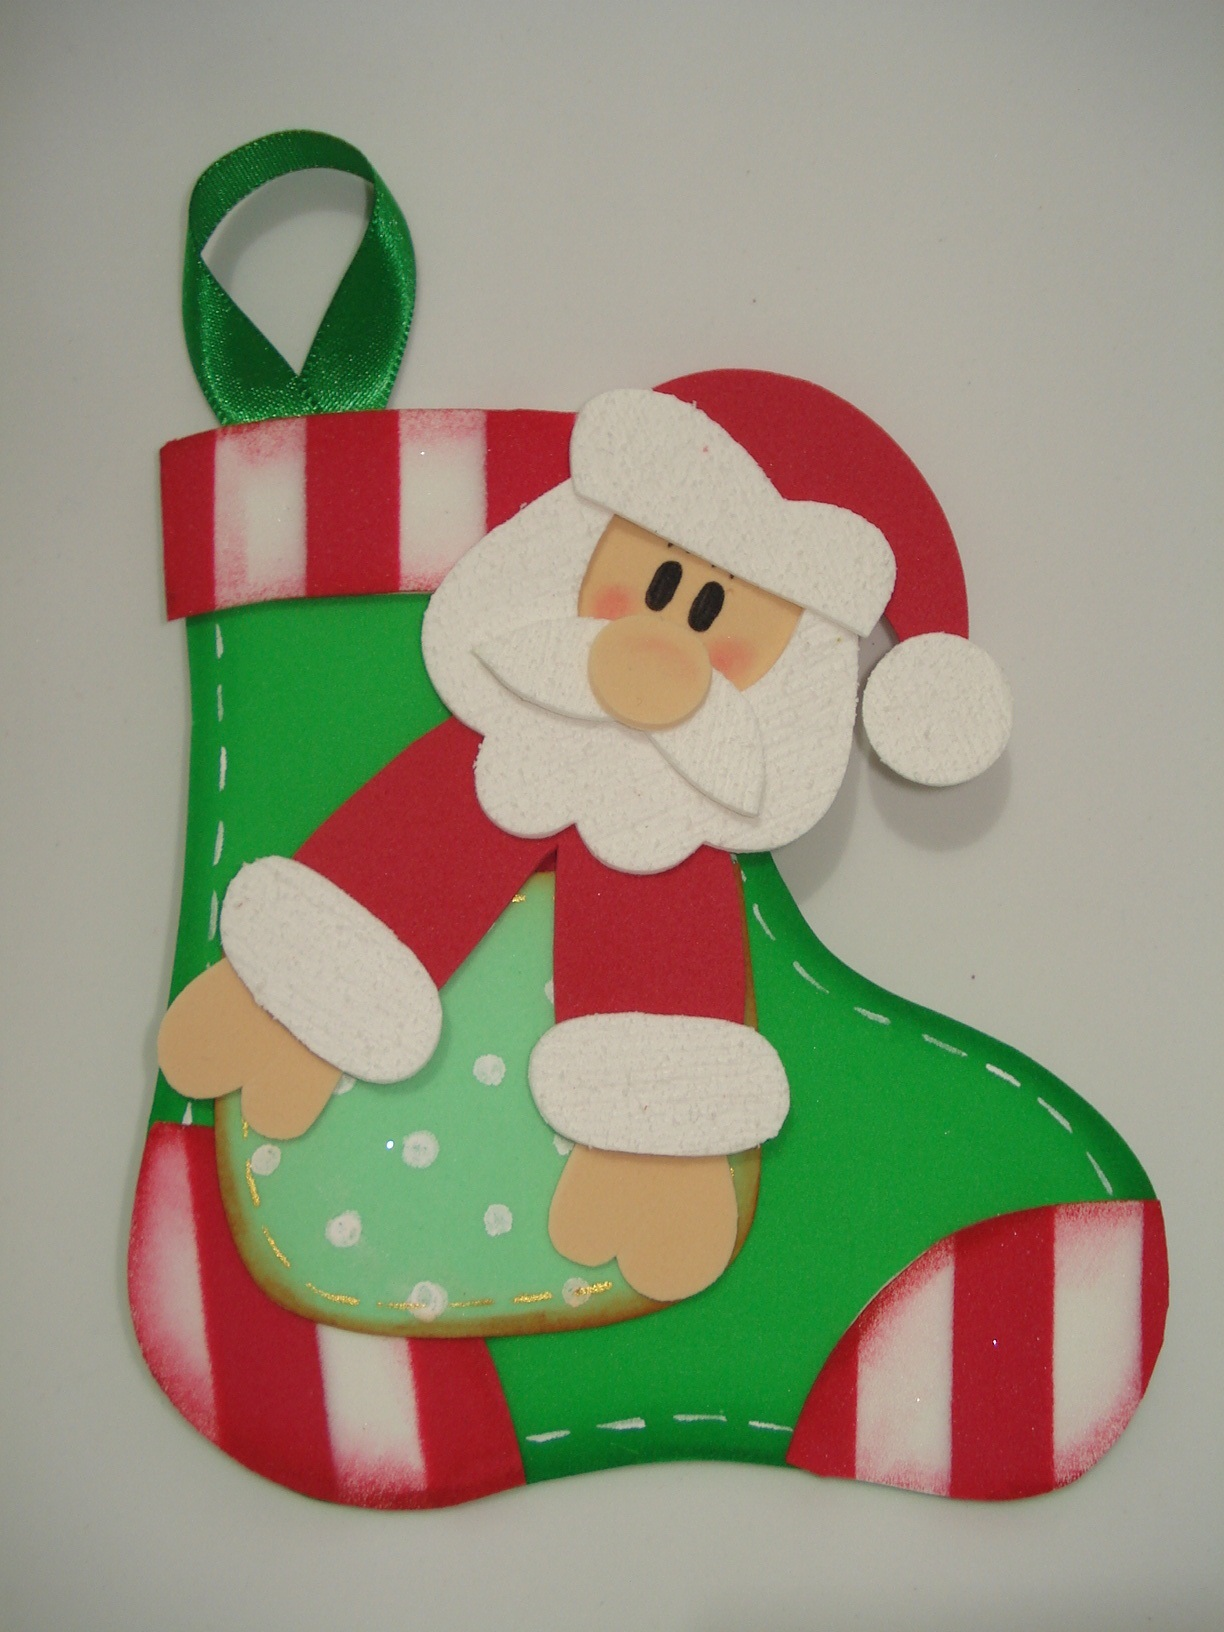 Enfeite De Natal ~ Enfeite de Natal Papai Noel na meia Lá na minha escola Elo7